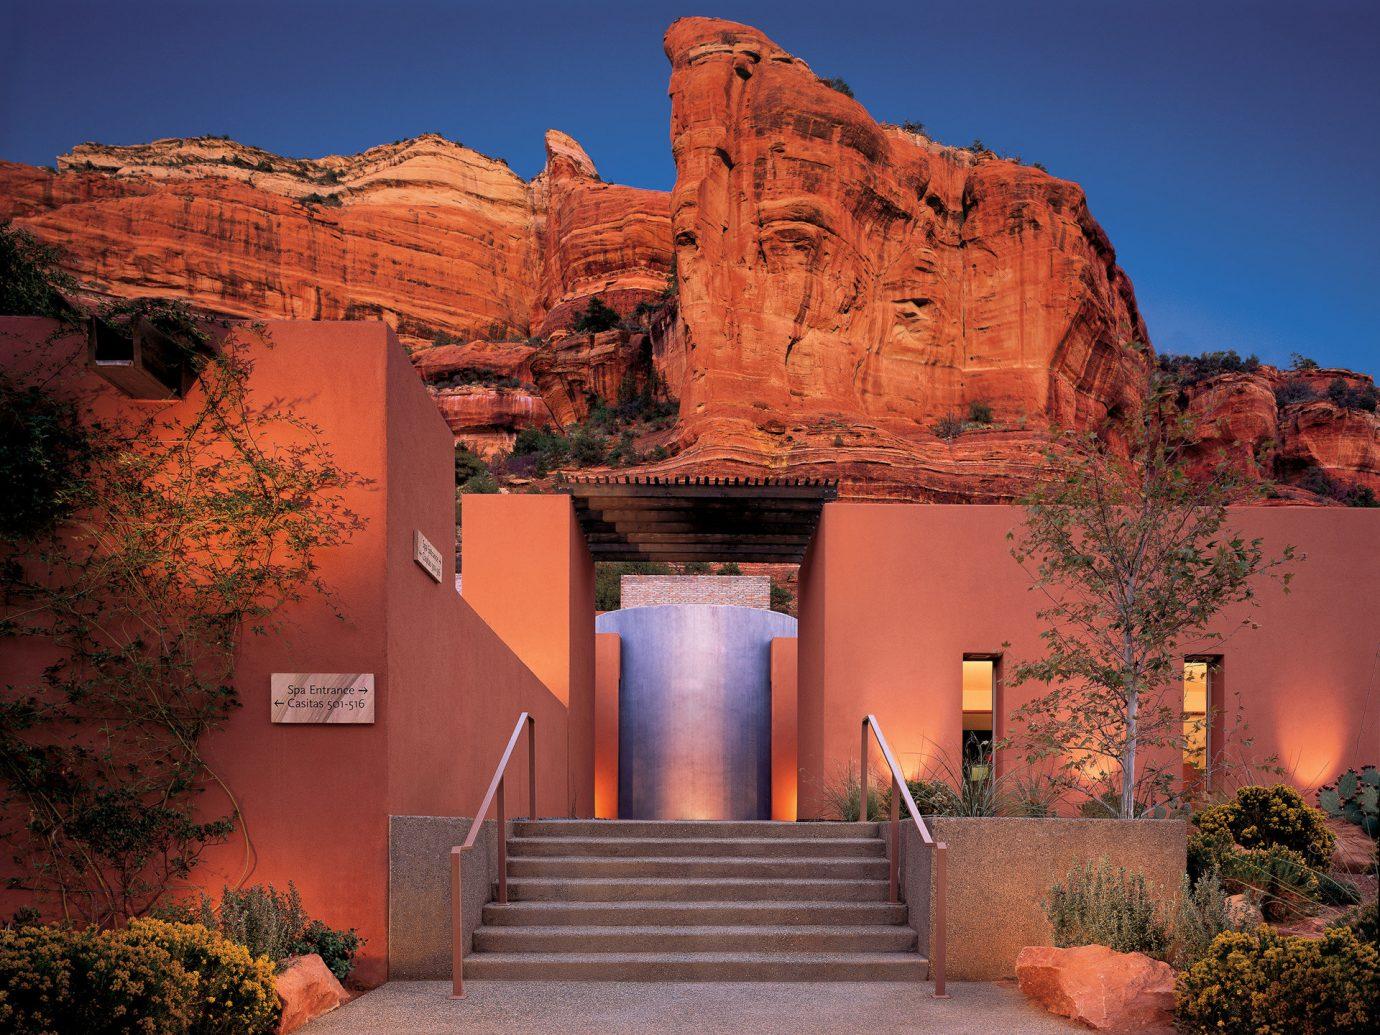 Trip Ideas tree outdoor valley canyon landmark Architecture arch rock landscape estate evening Sunset bushes stone